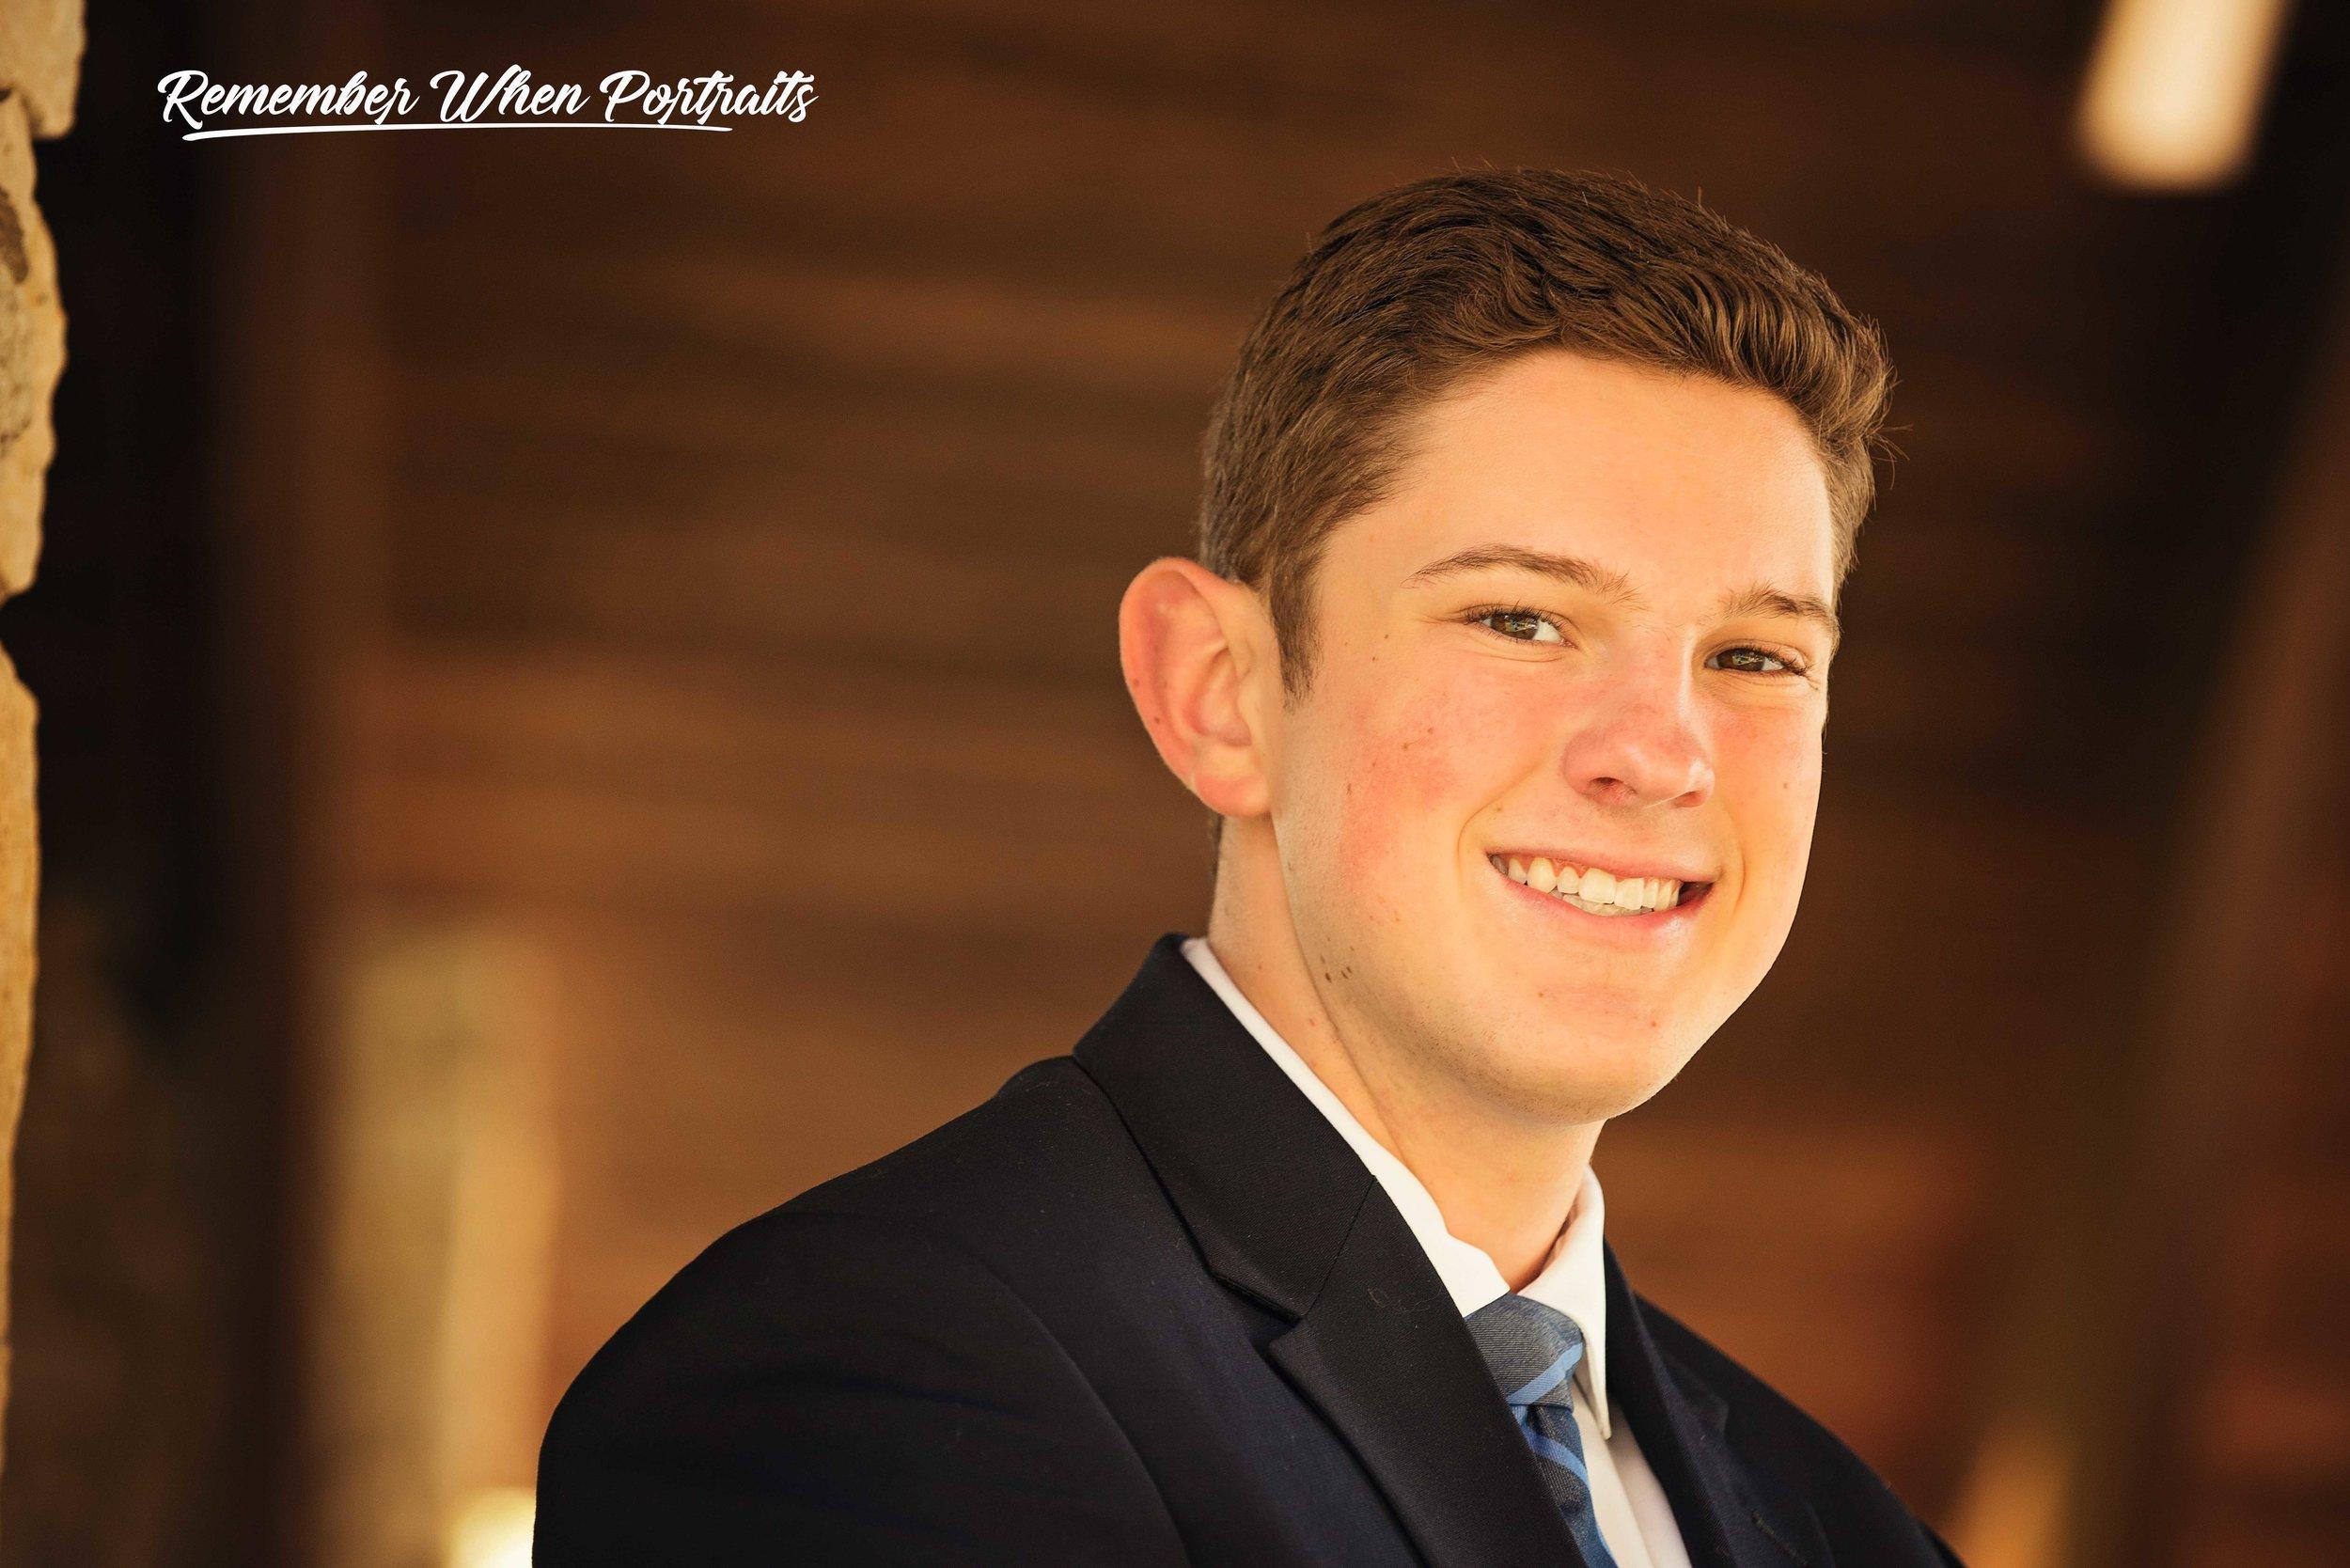 Ryan Highfield Little Miami High School Class of 2020 Remember When Portraits Cincinnati Ohio